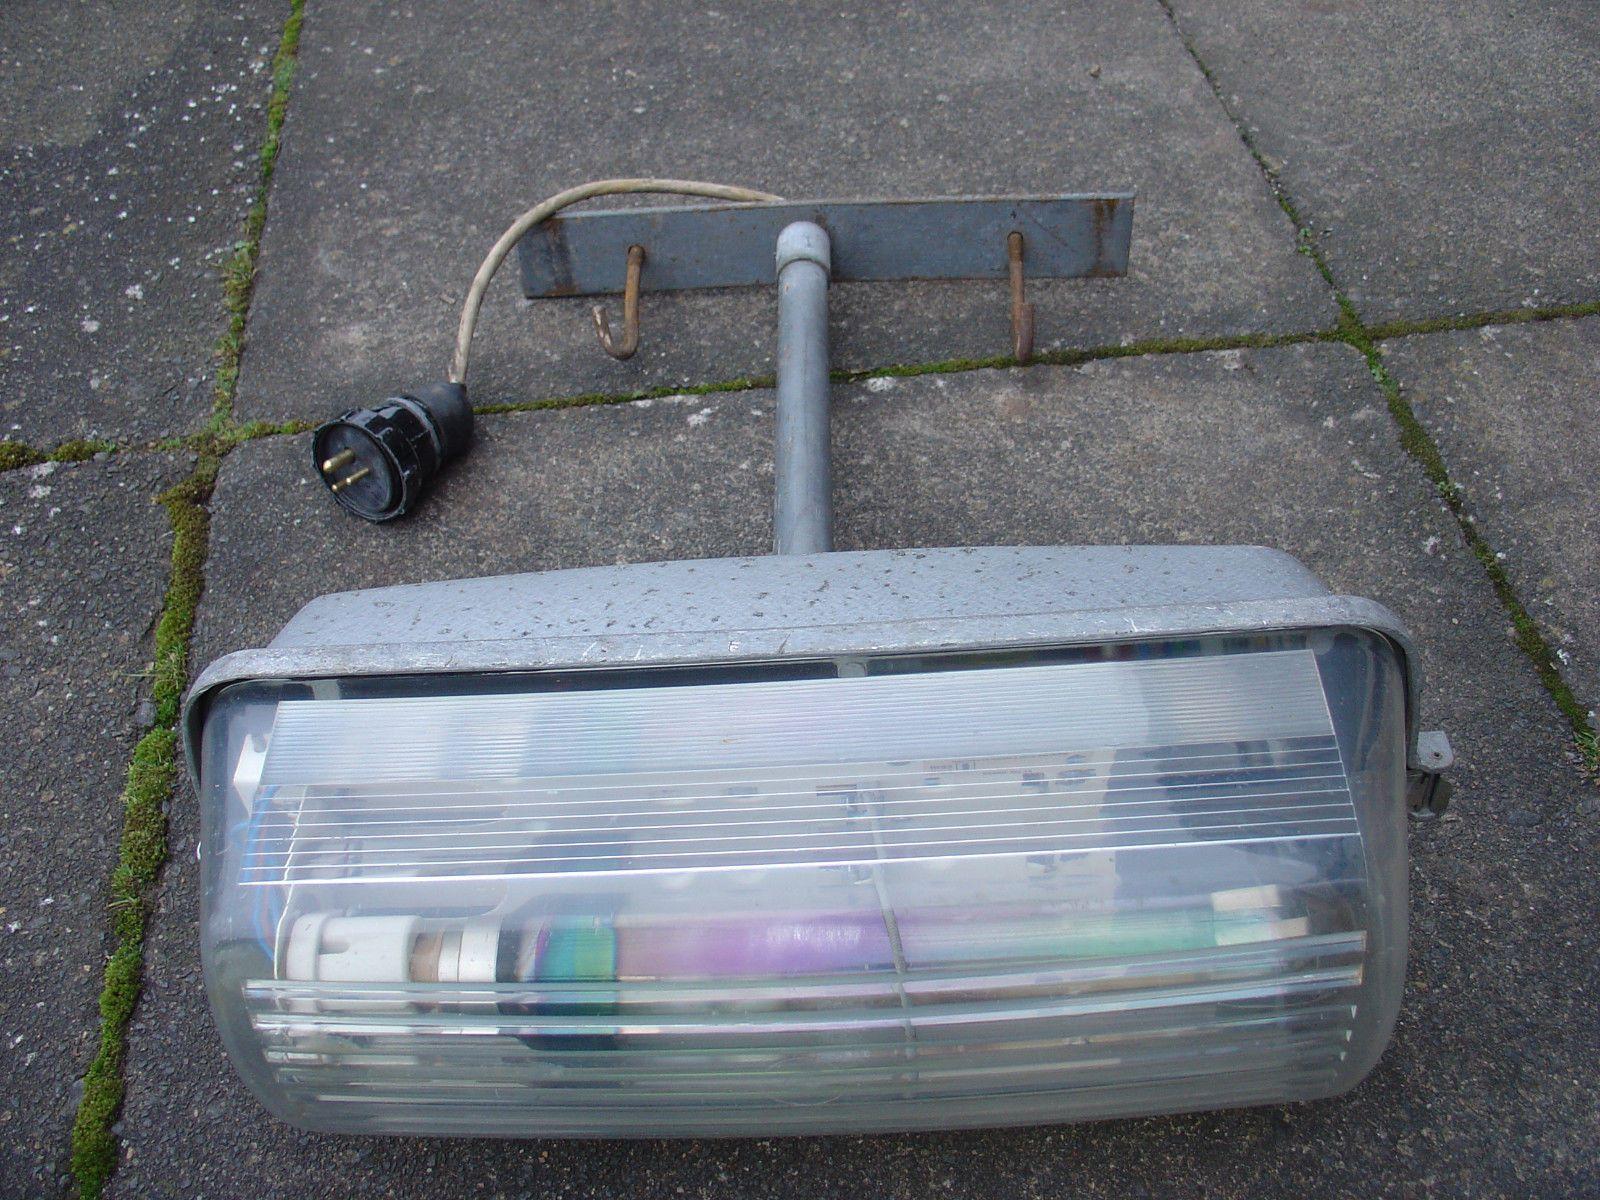 1981 Thorn Beta 5 Street Light Lantern